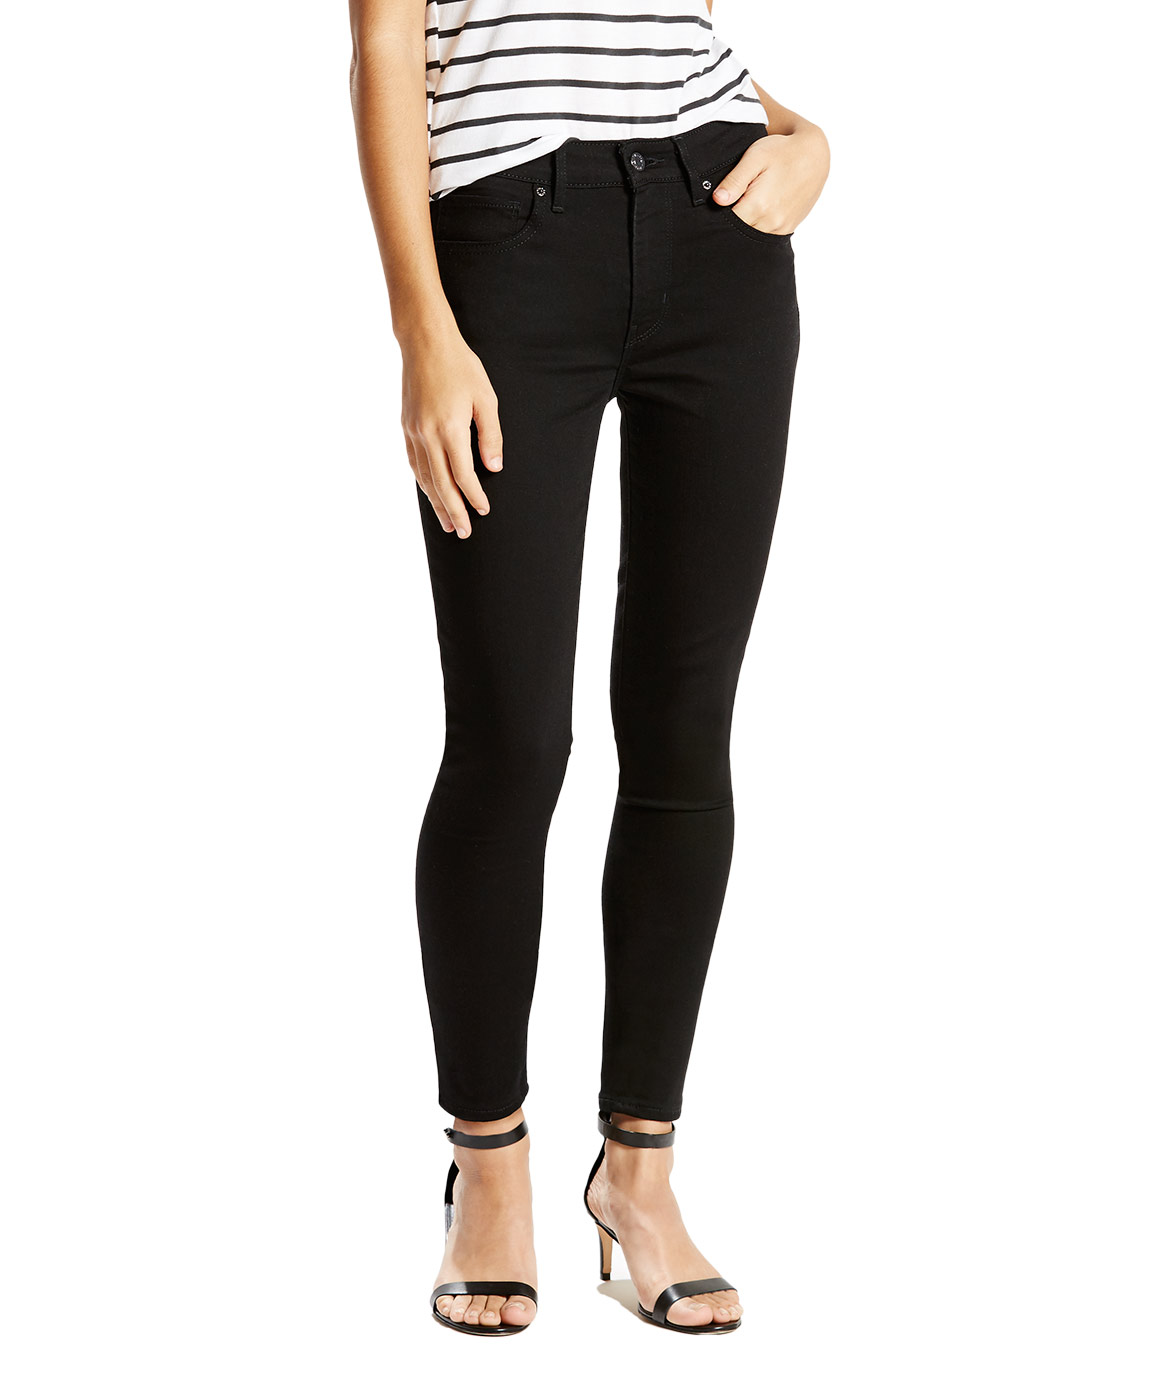 Hosen für Frauen - Levis 721 HIGH RISE SKINNY Slim Fit Black Sheep  - Onlineshop Jeans Meile